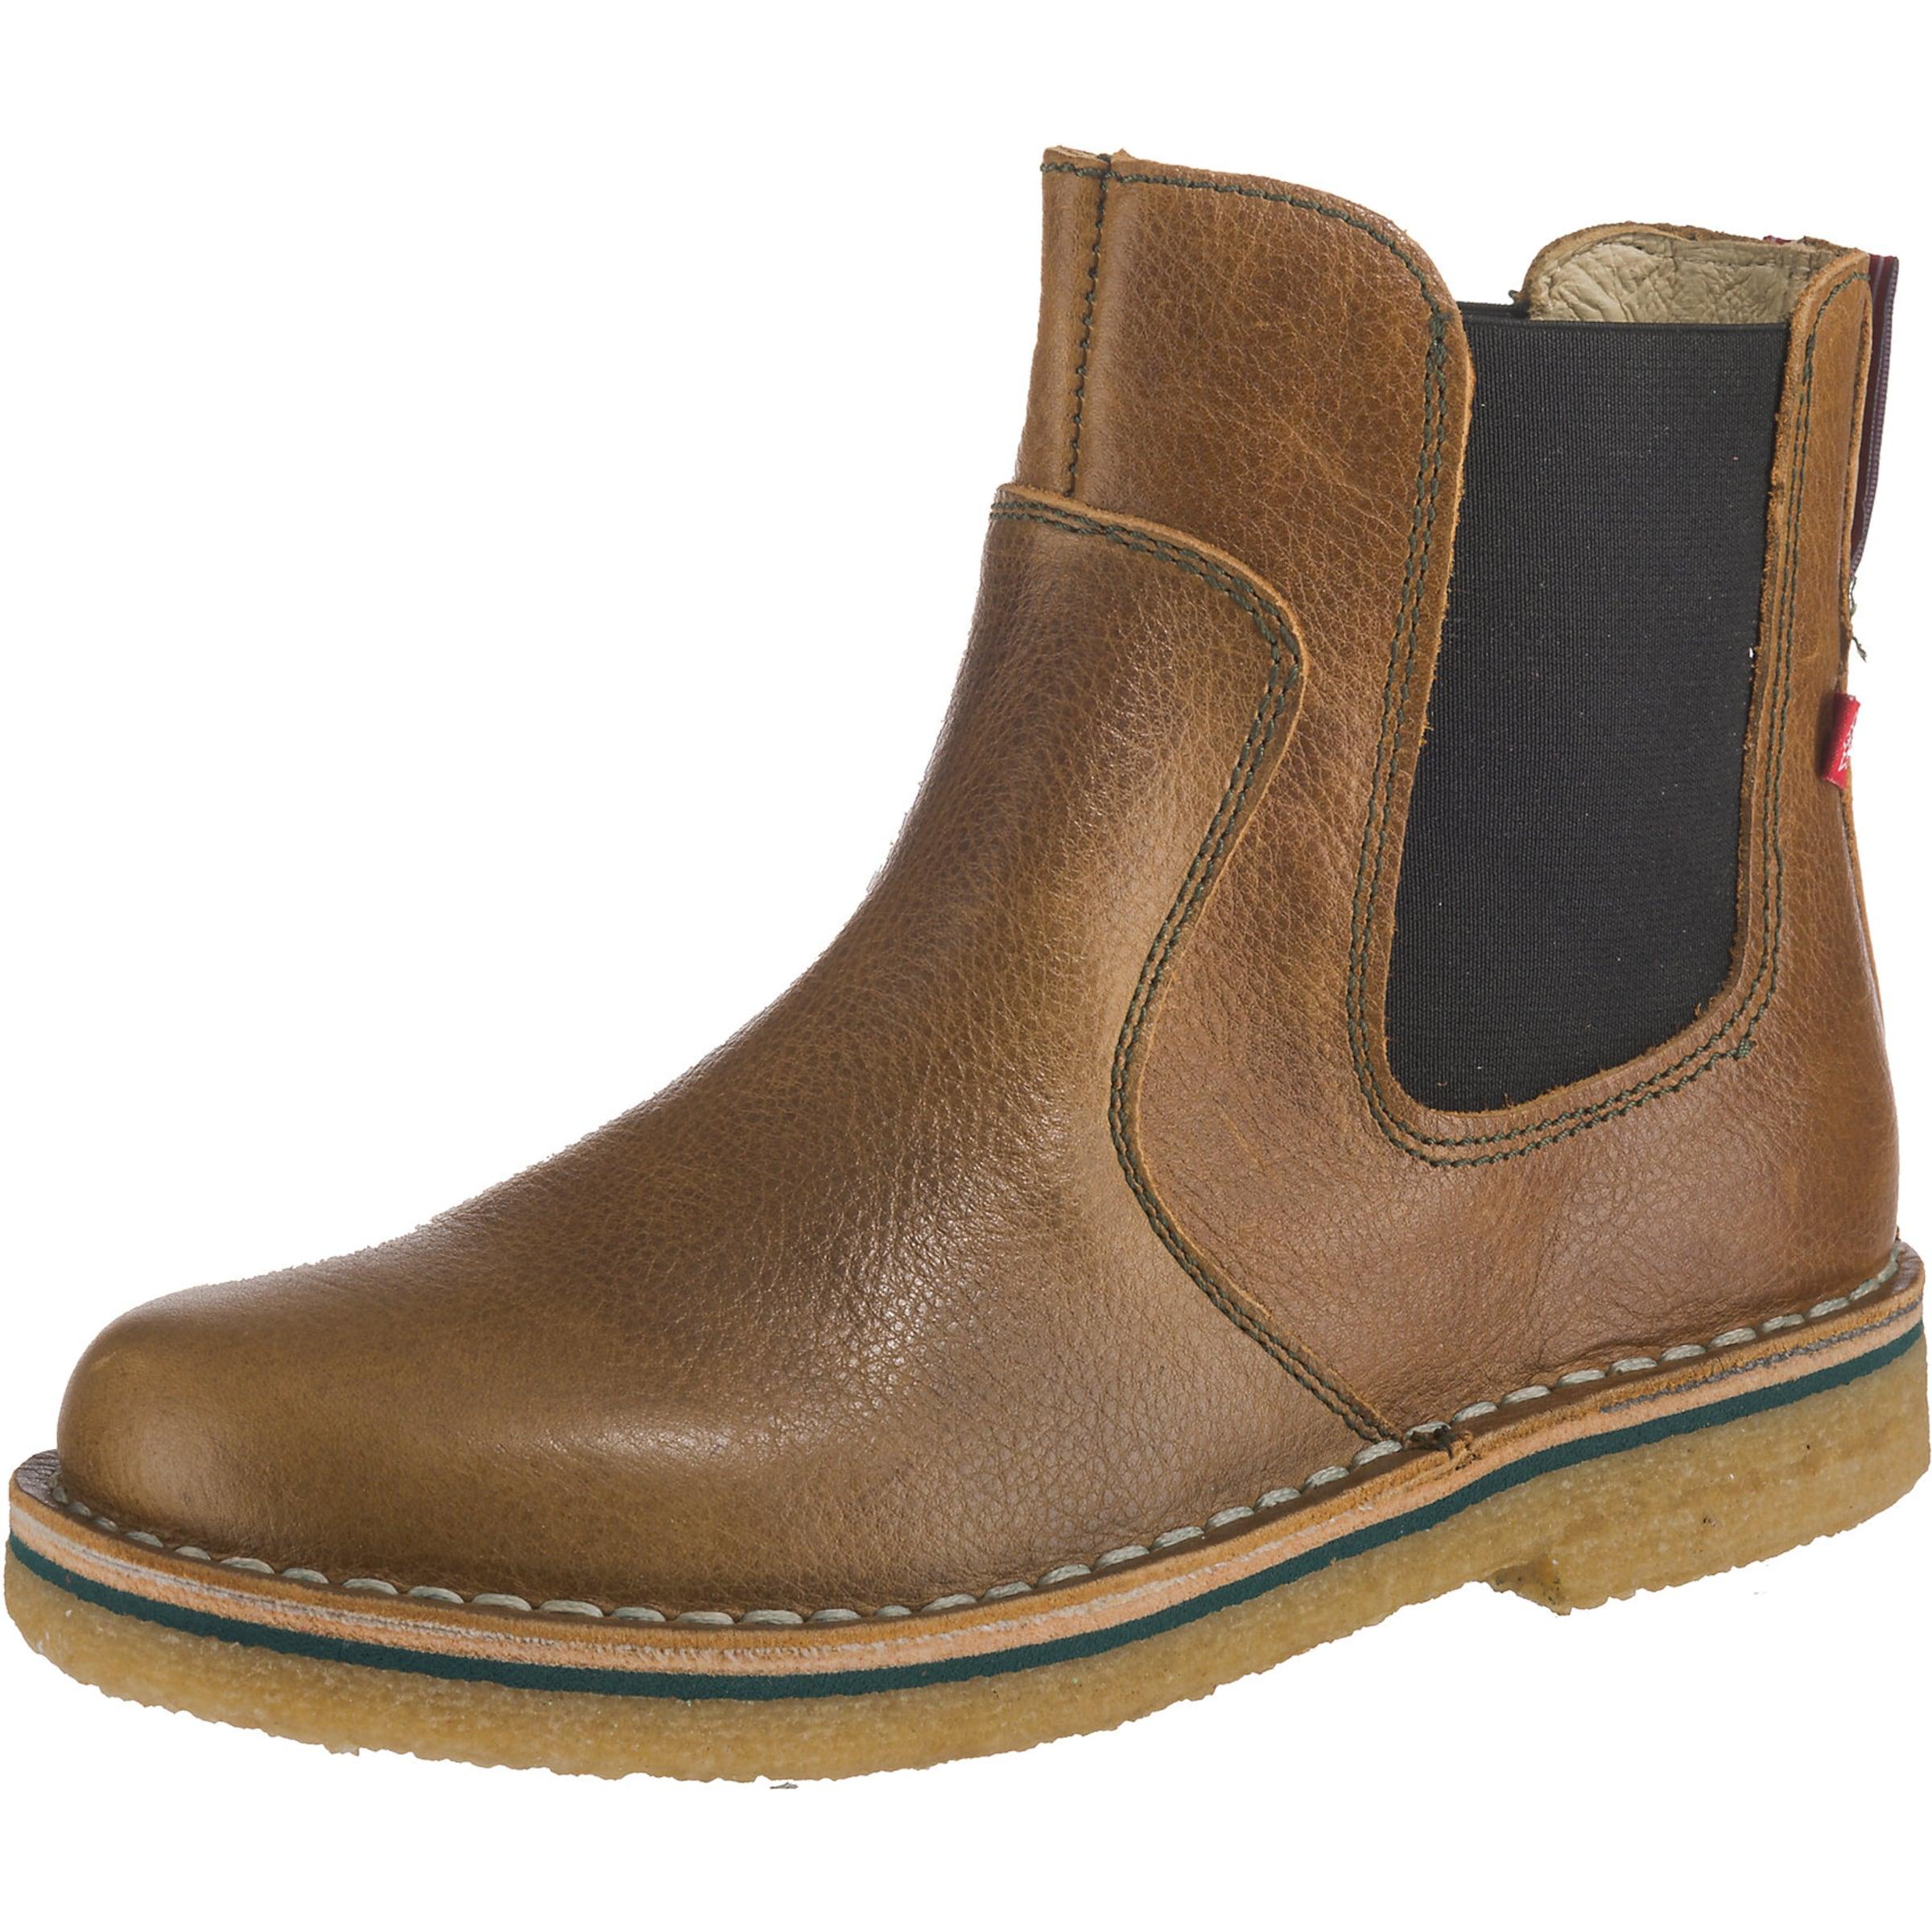 Braun Chelsea Grünbein K' Boots 'irma In 8kON0PXnw